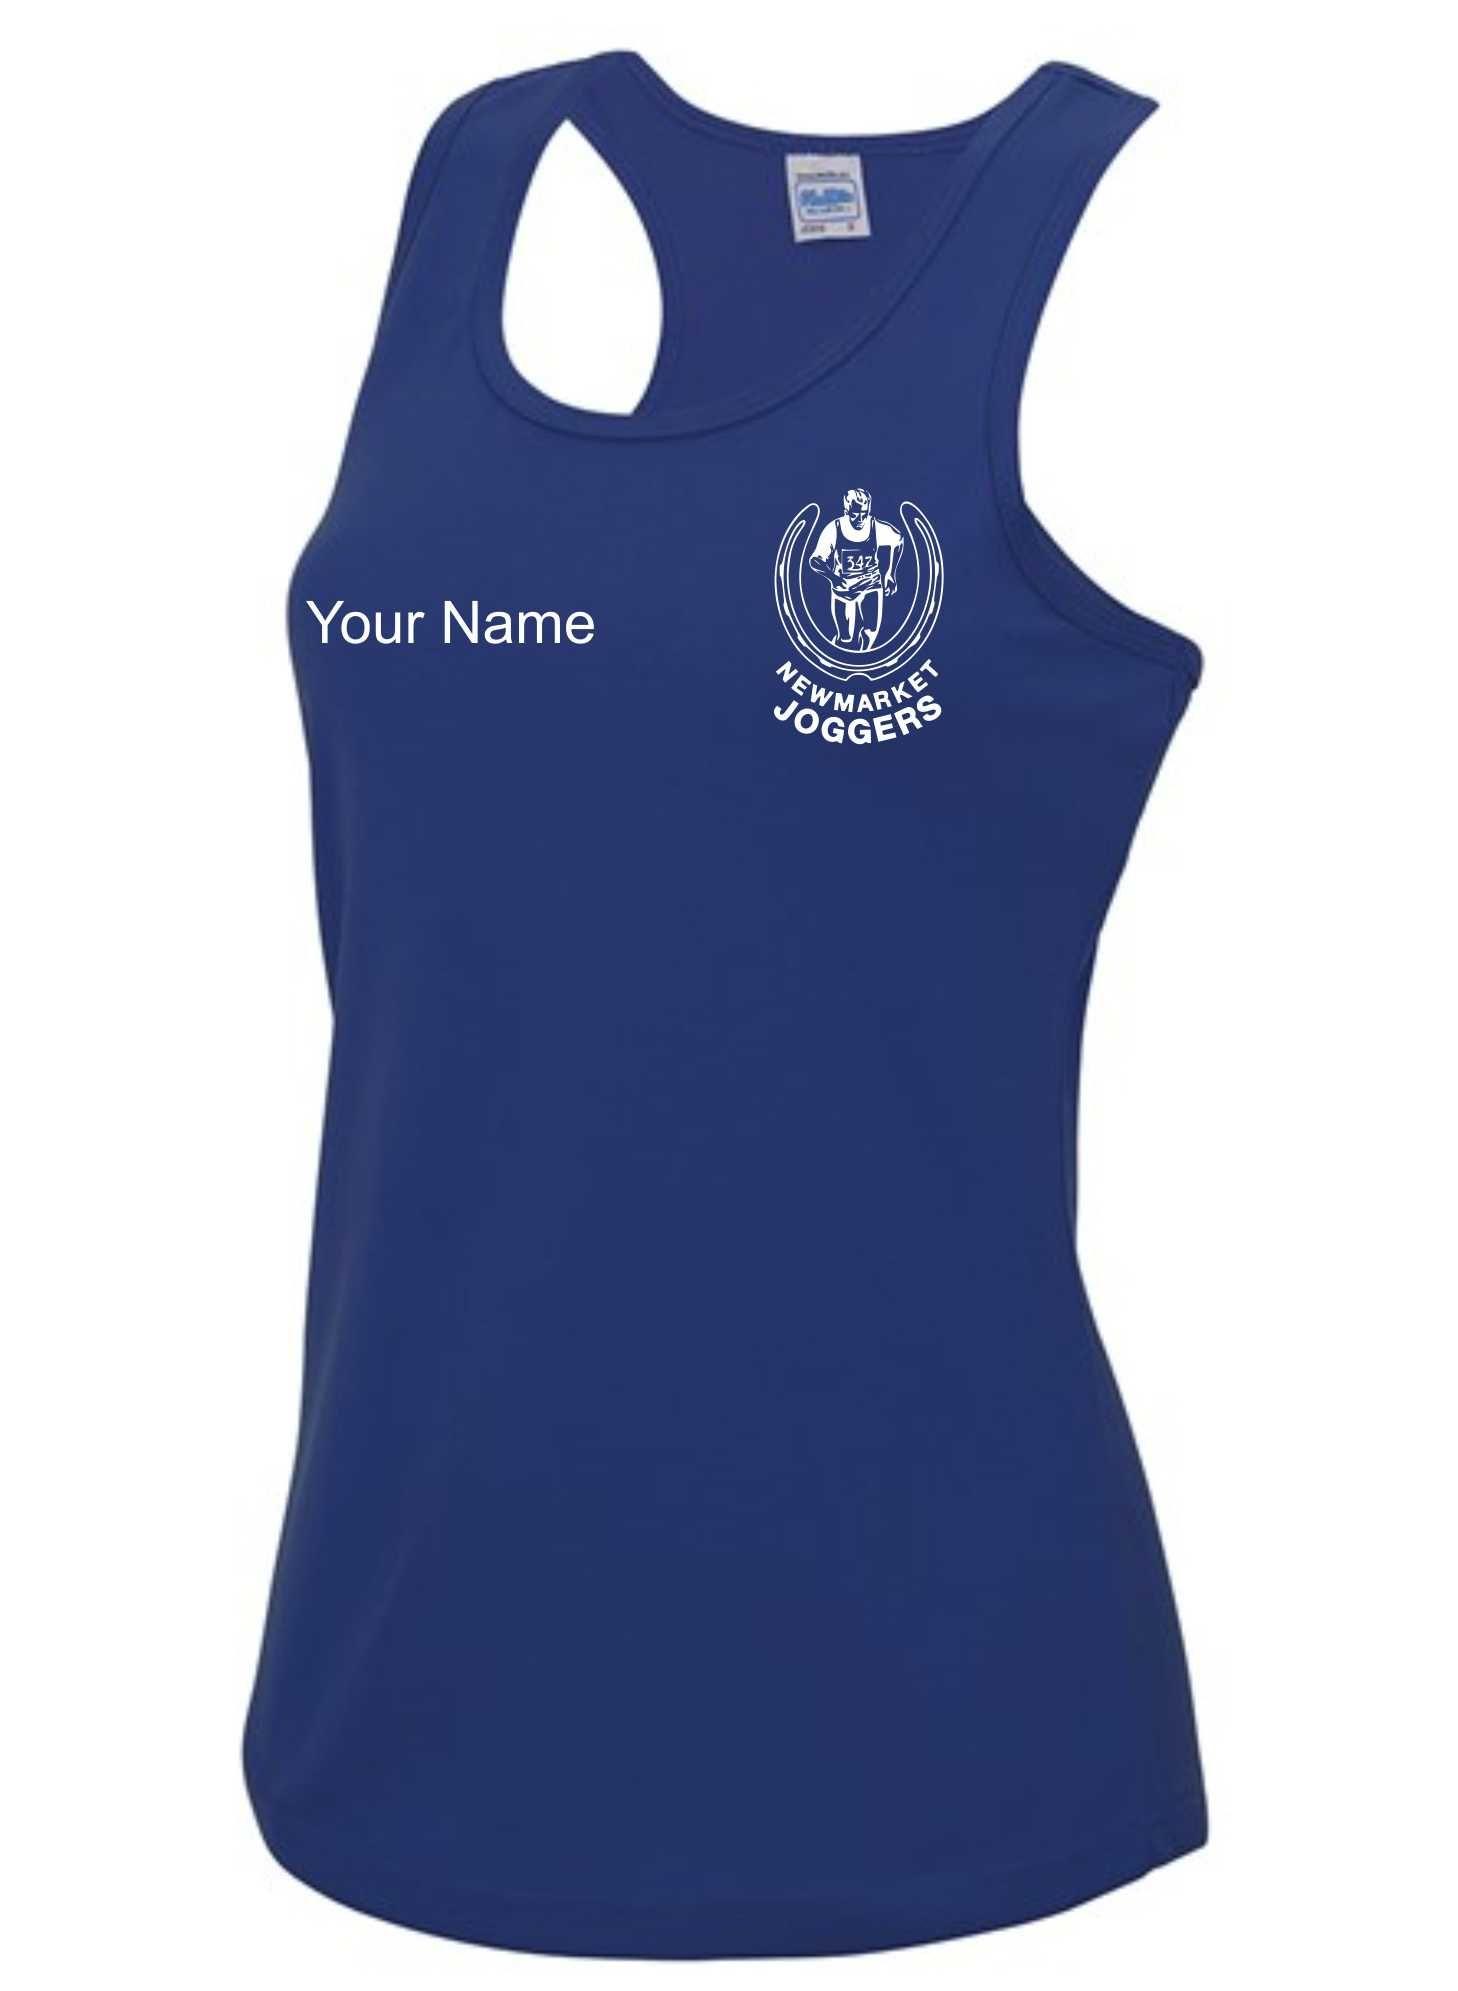 Newmarket Joggers – Performance Vest (Ladies)